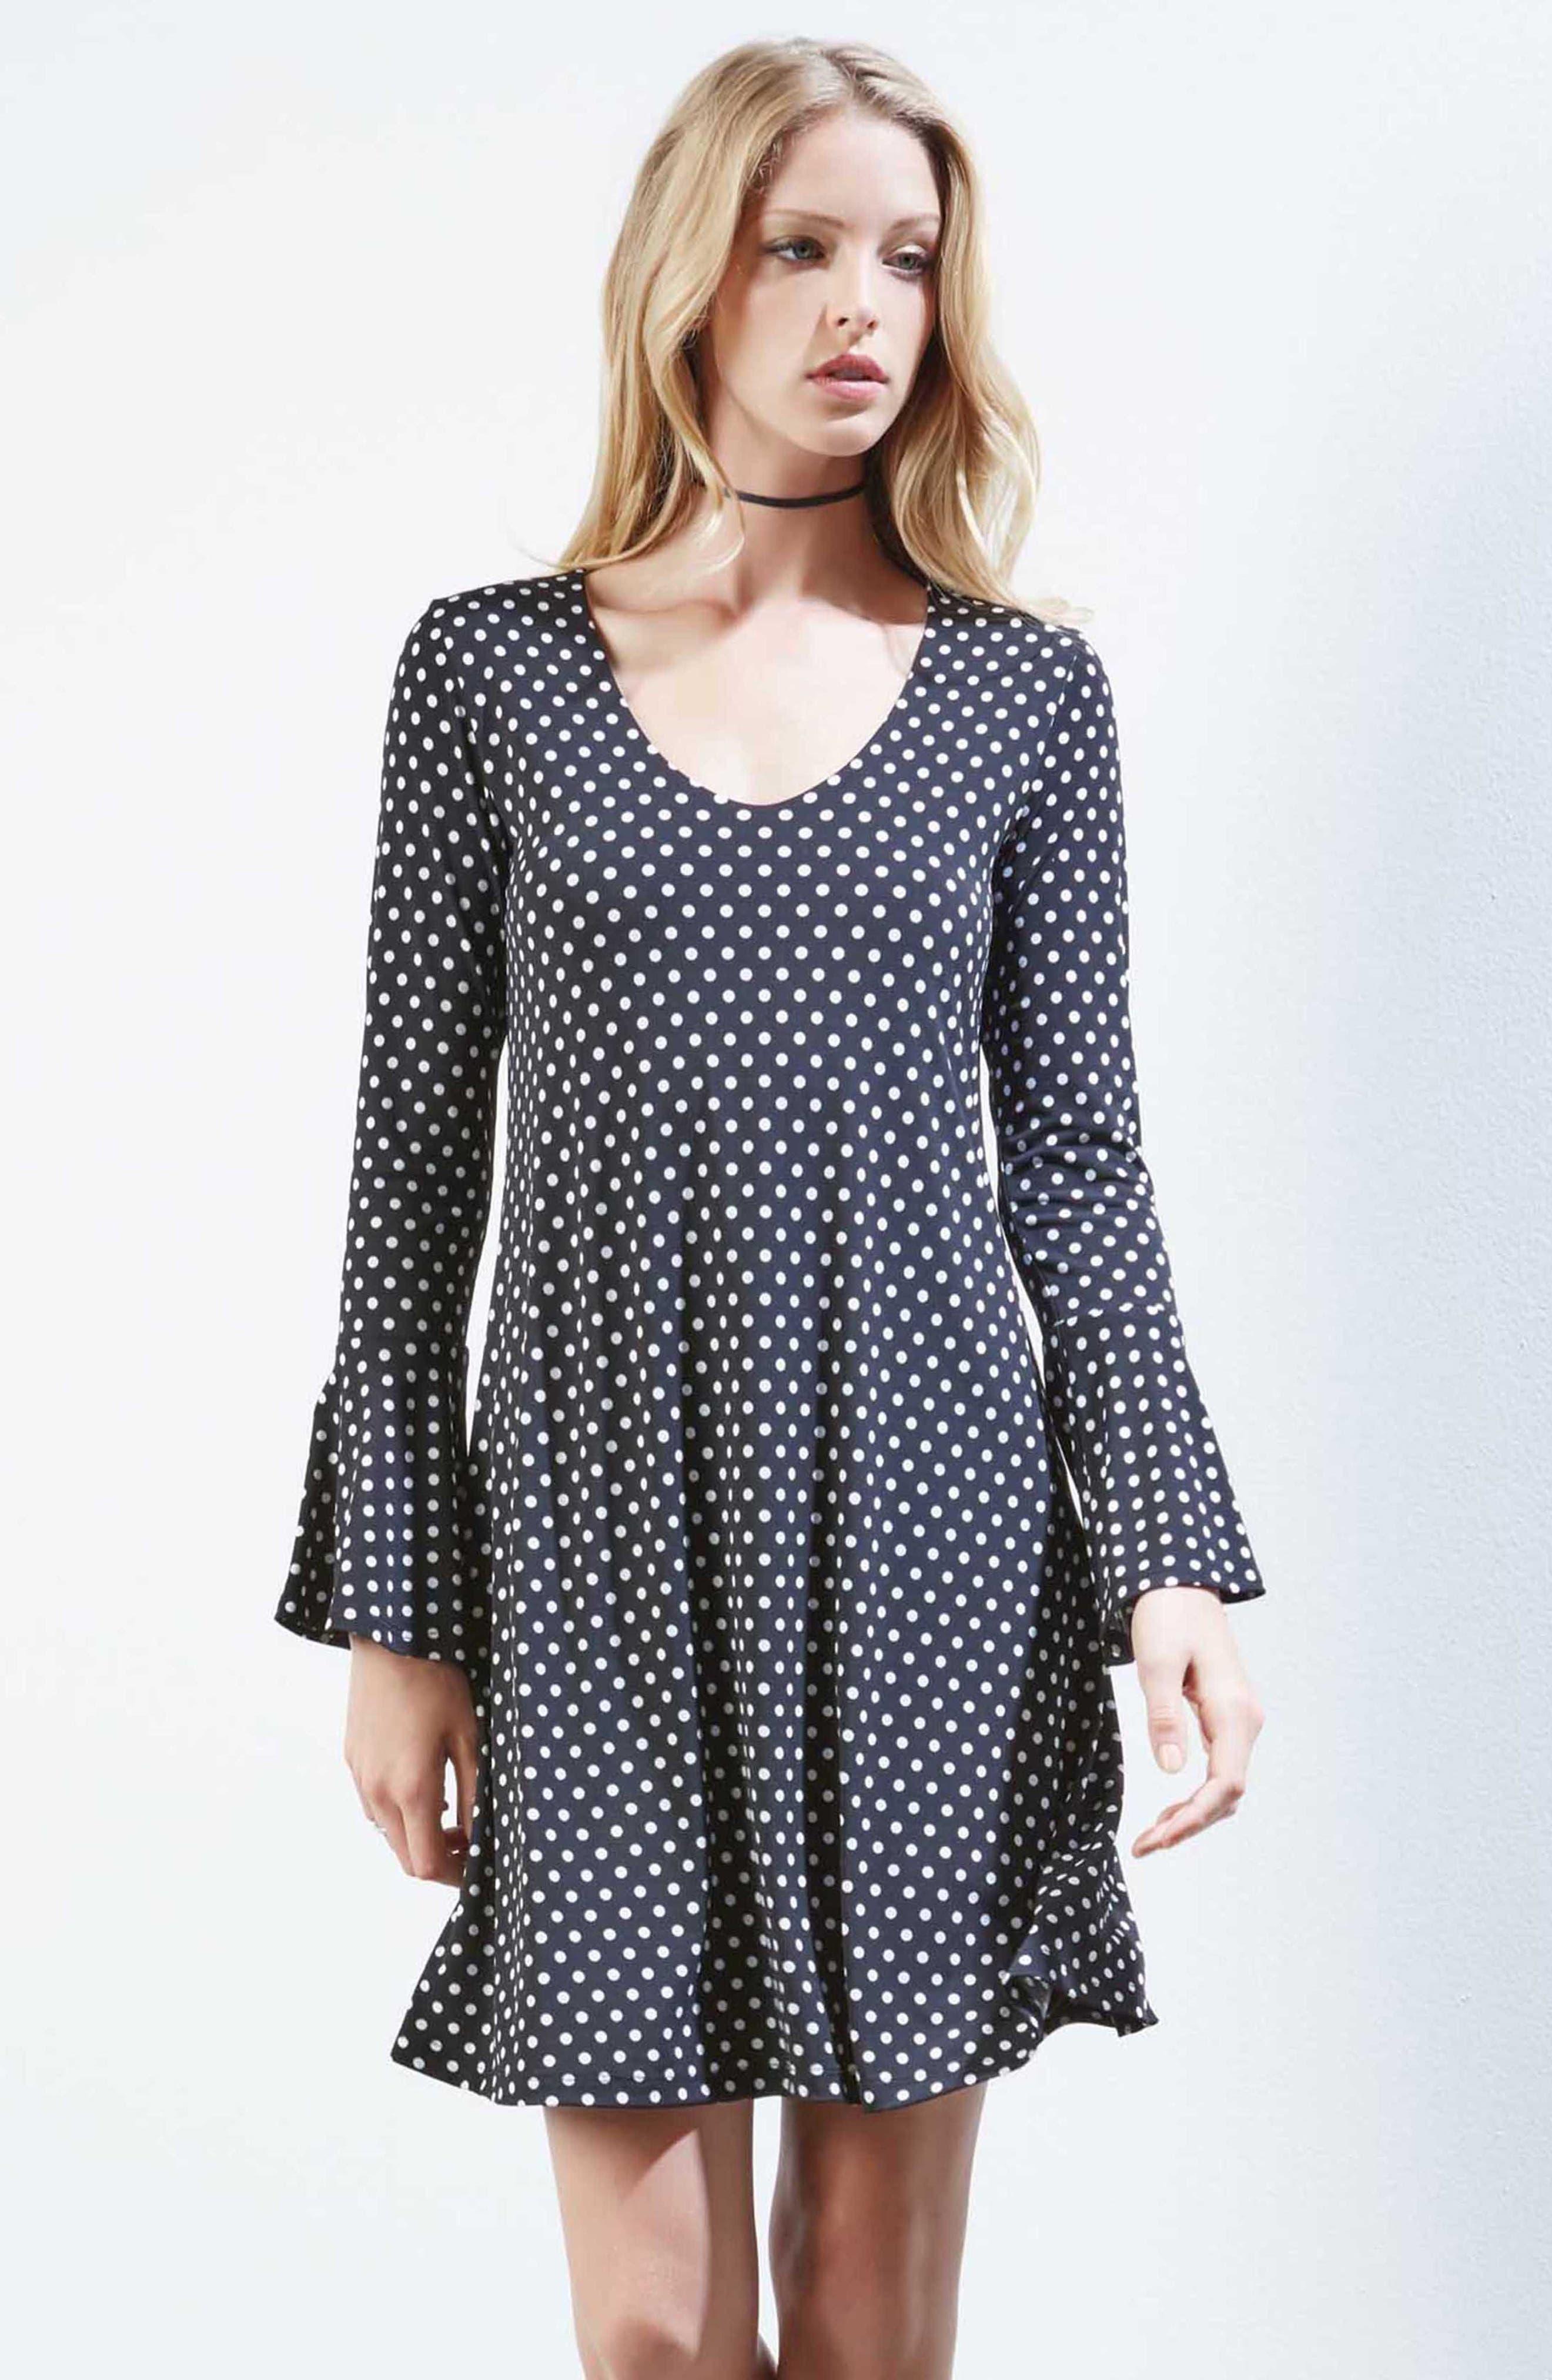 Polka Dot A-Line Dress,                             Alternate thumbnail 2, color,                             Dotted